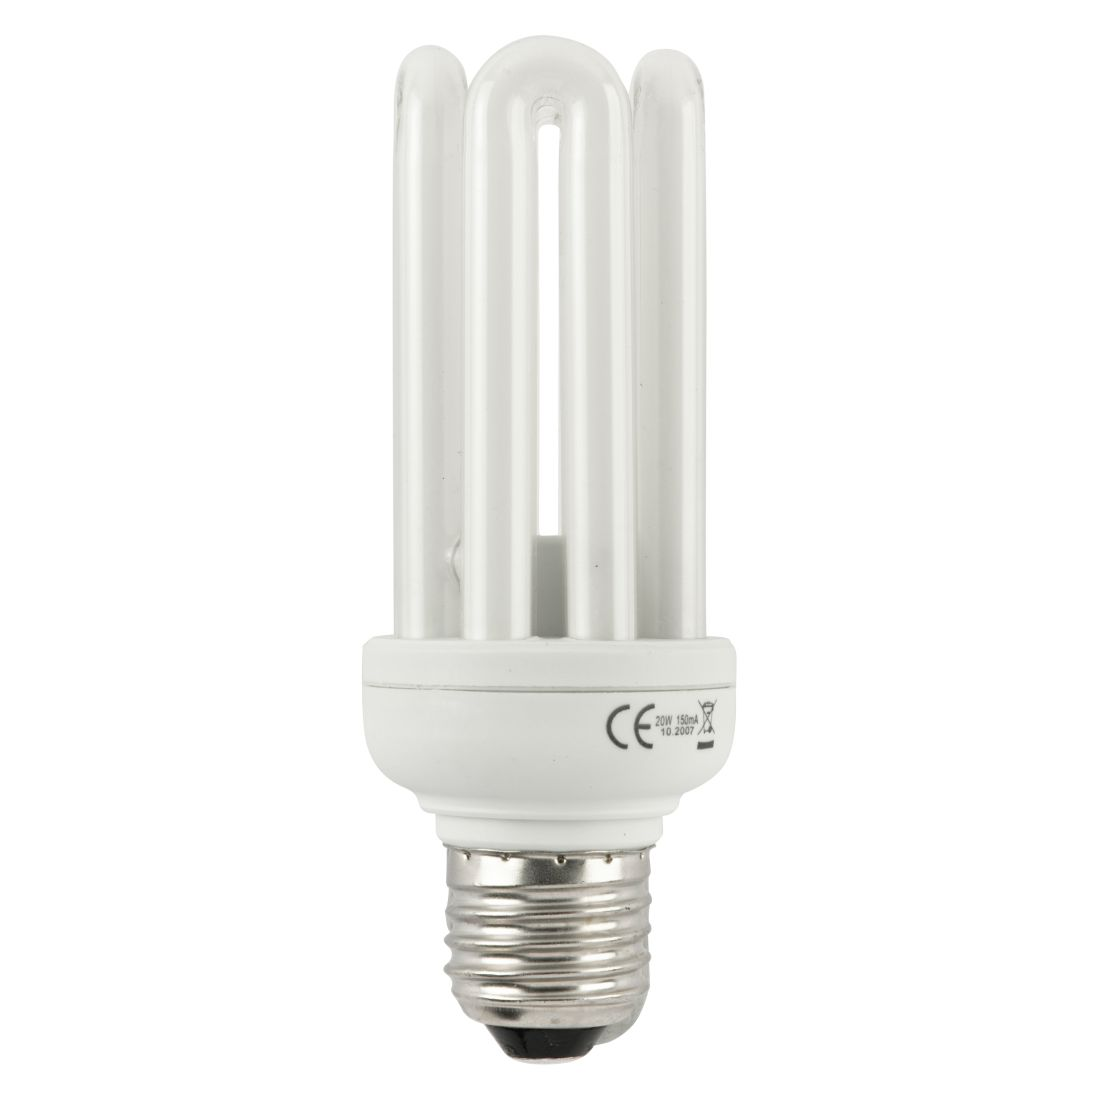 Energiesparlampe E27 20 W Spirale ● Glas Weiß- ikarus